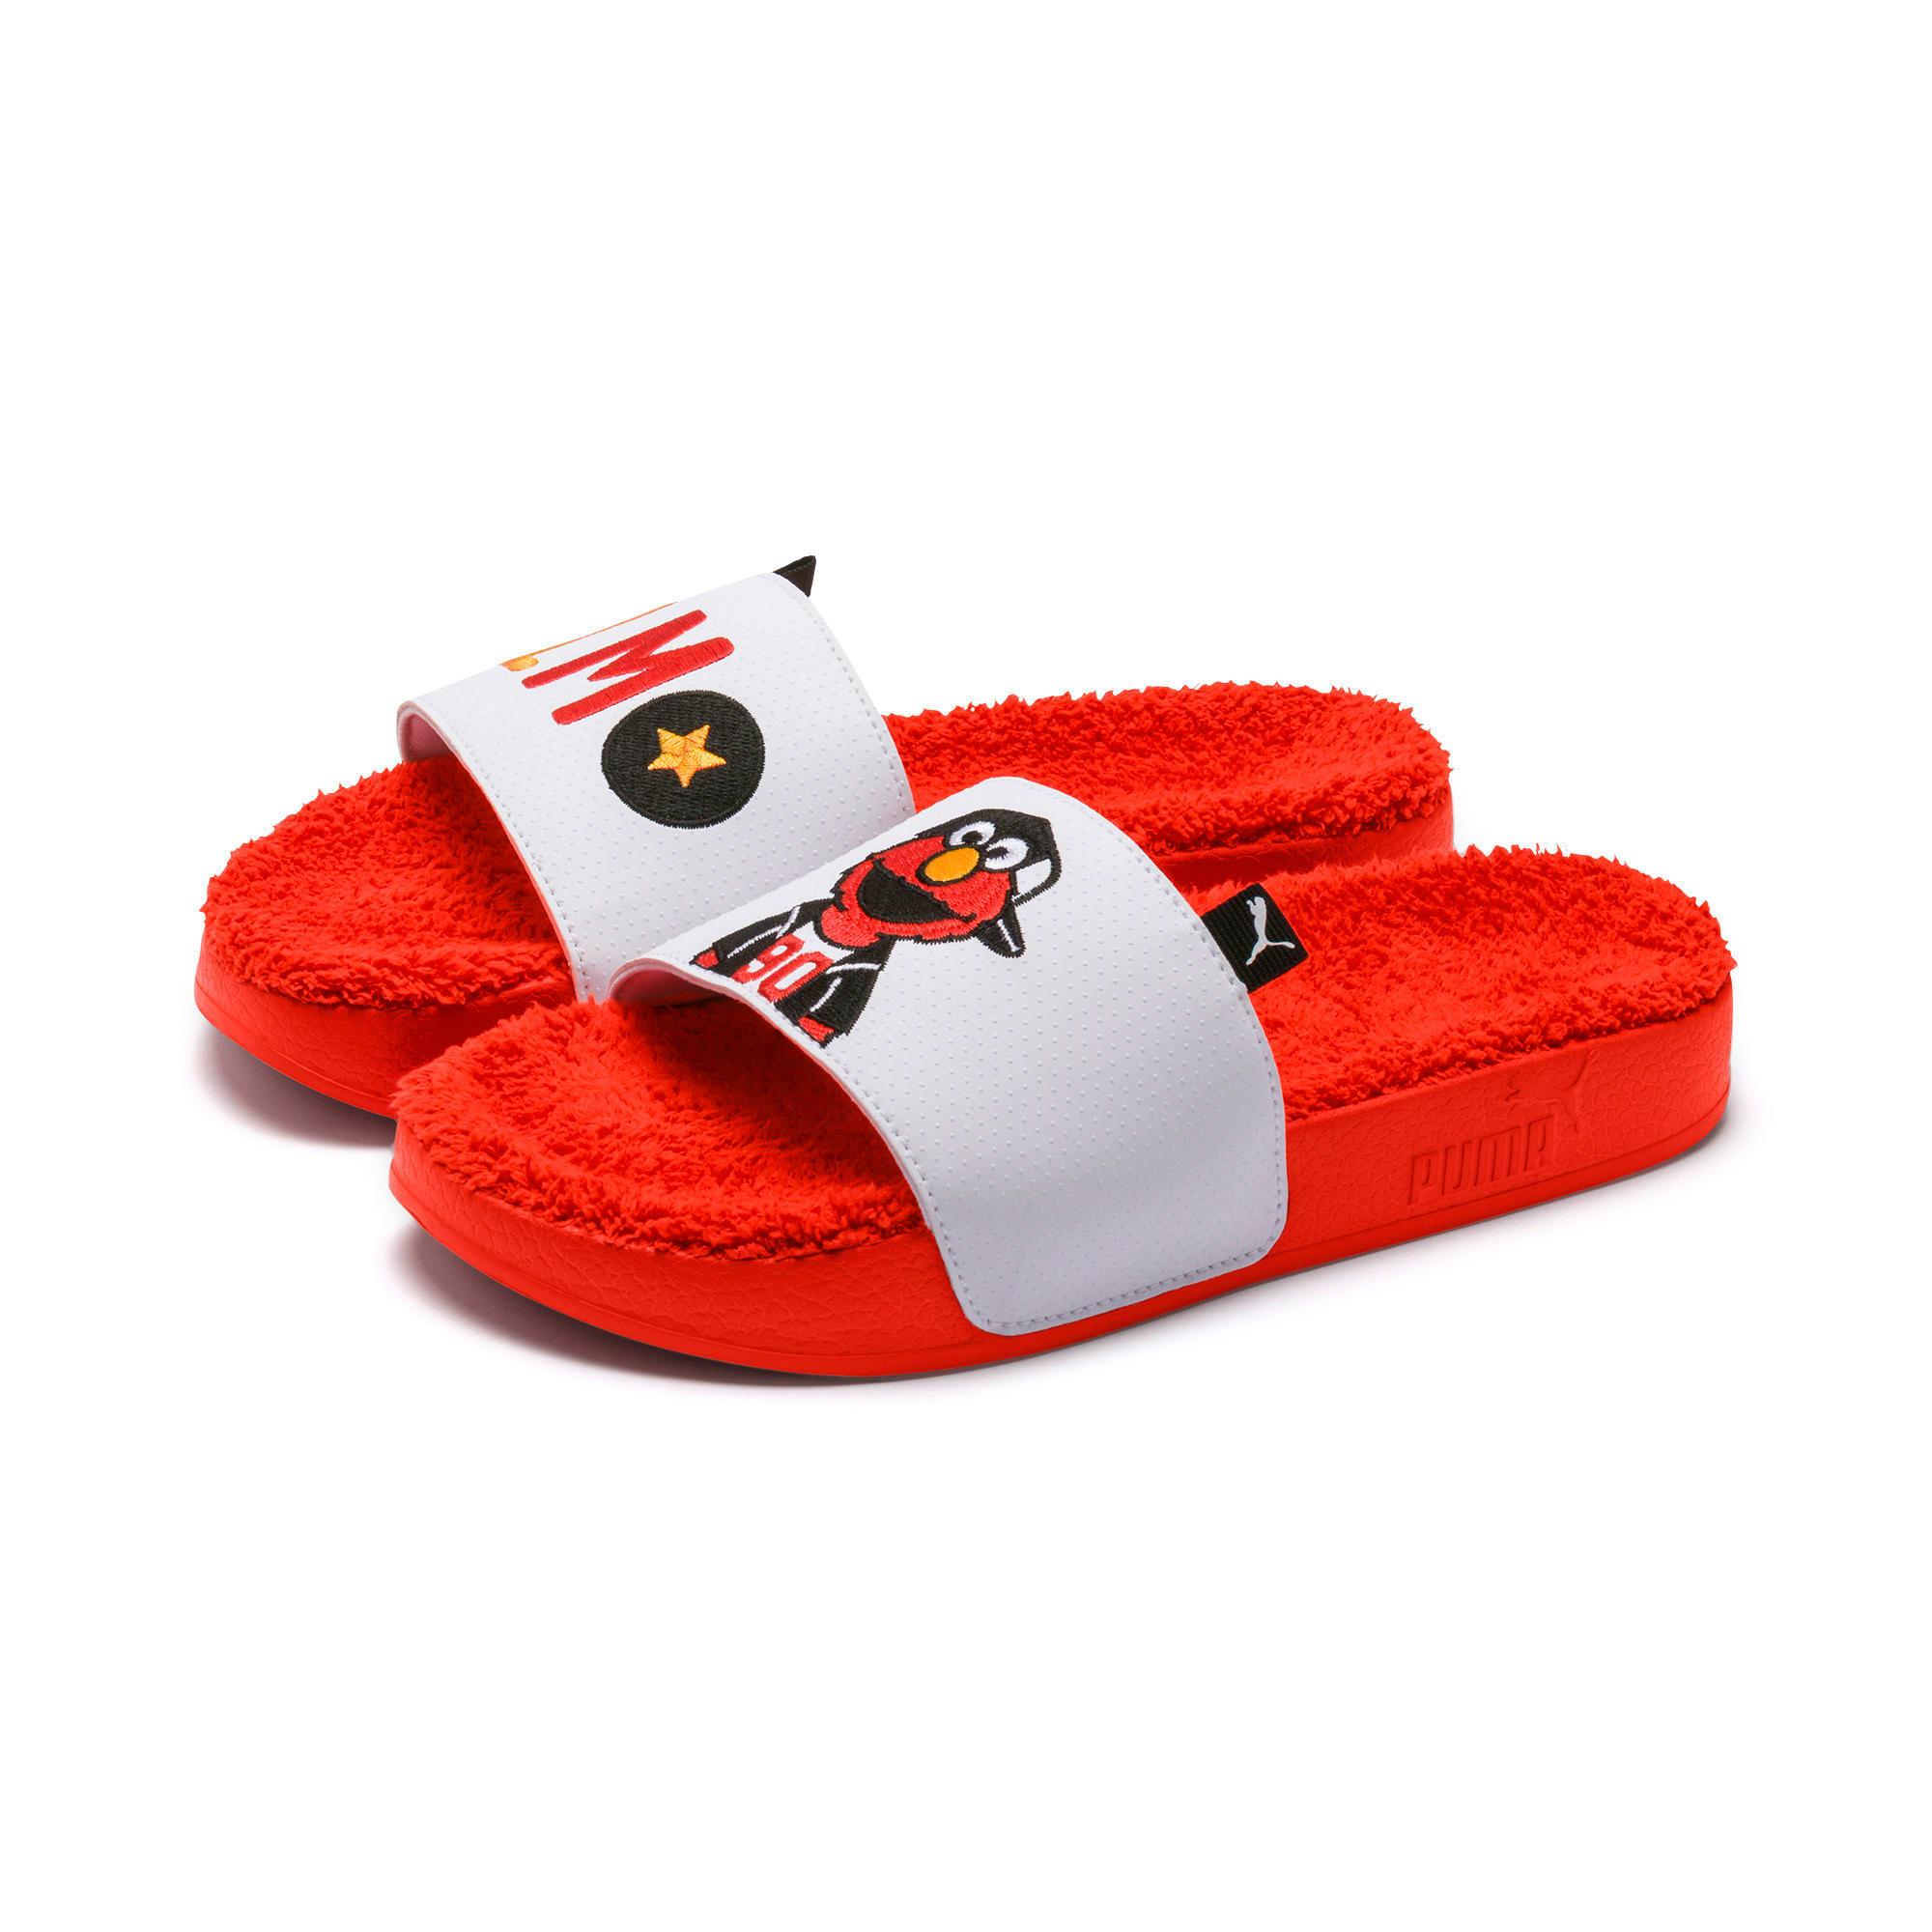 Thumbnail 8 of Sesame Street Kids' Leadcat Sandals, Cherry Tomato-Puma White, medium-IND